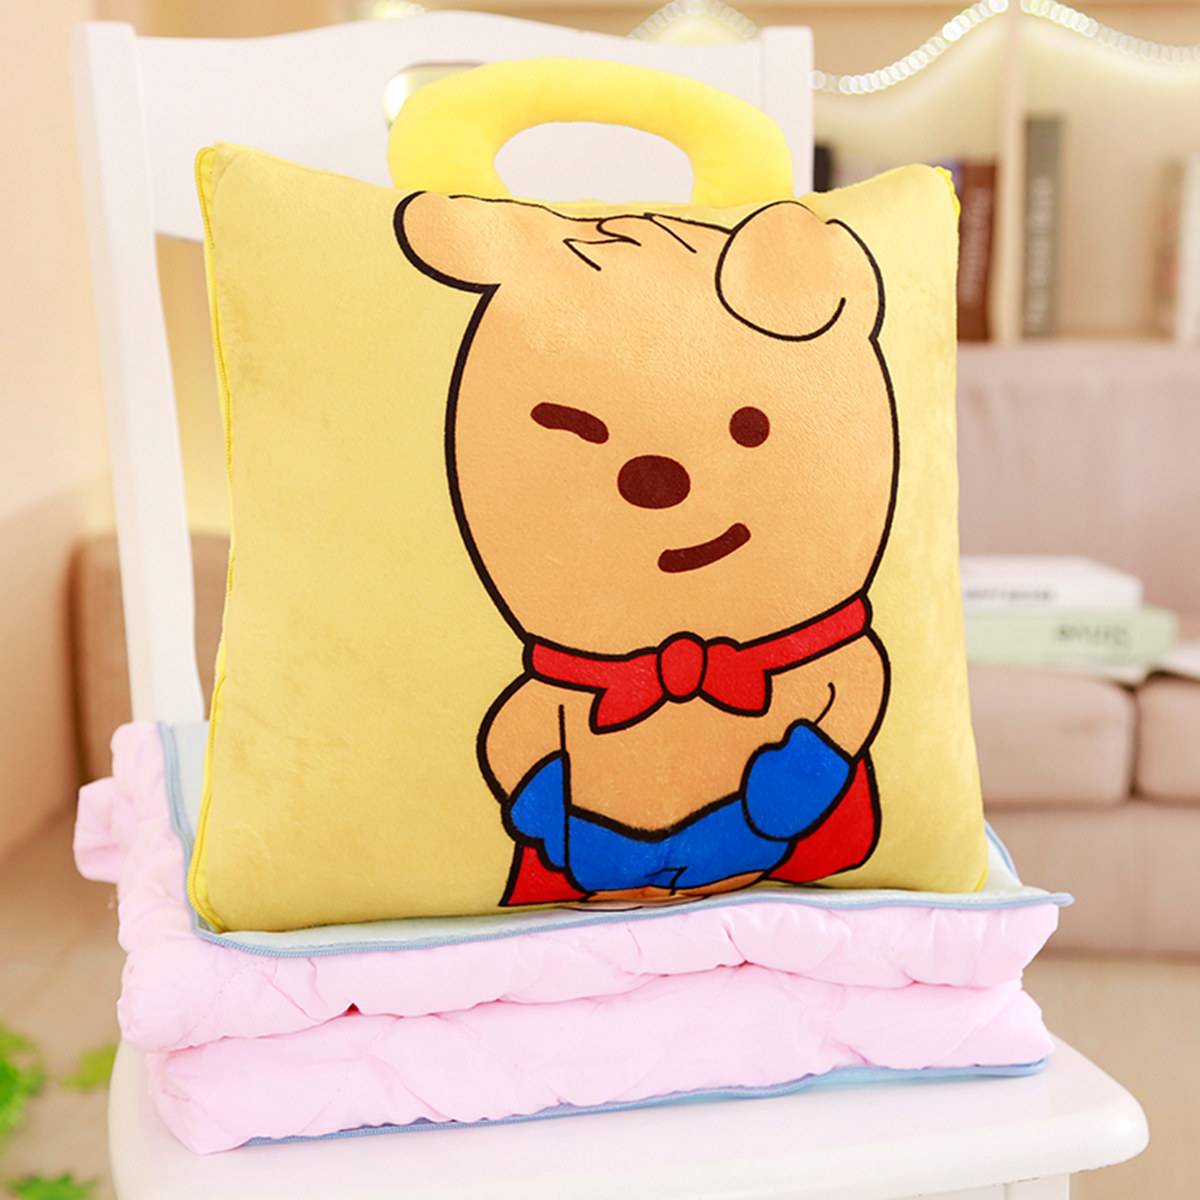 DUMBO IMPERMEABILE Stuffed Plush Doll Portachiavi Ornamento Ciondolo Portachiavi Bag